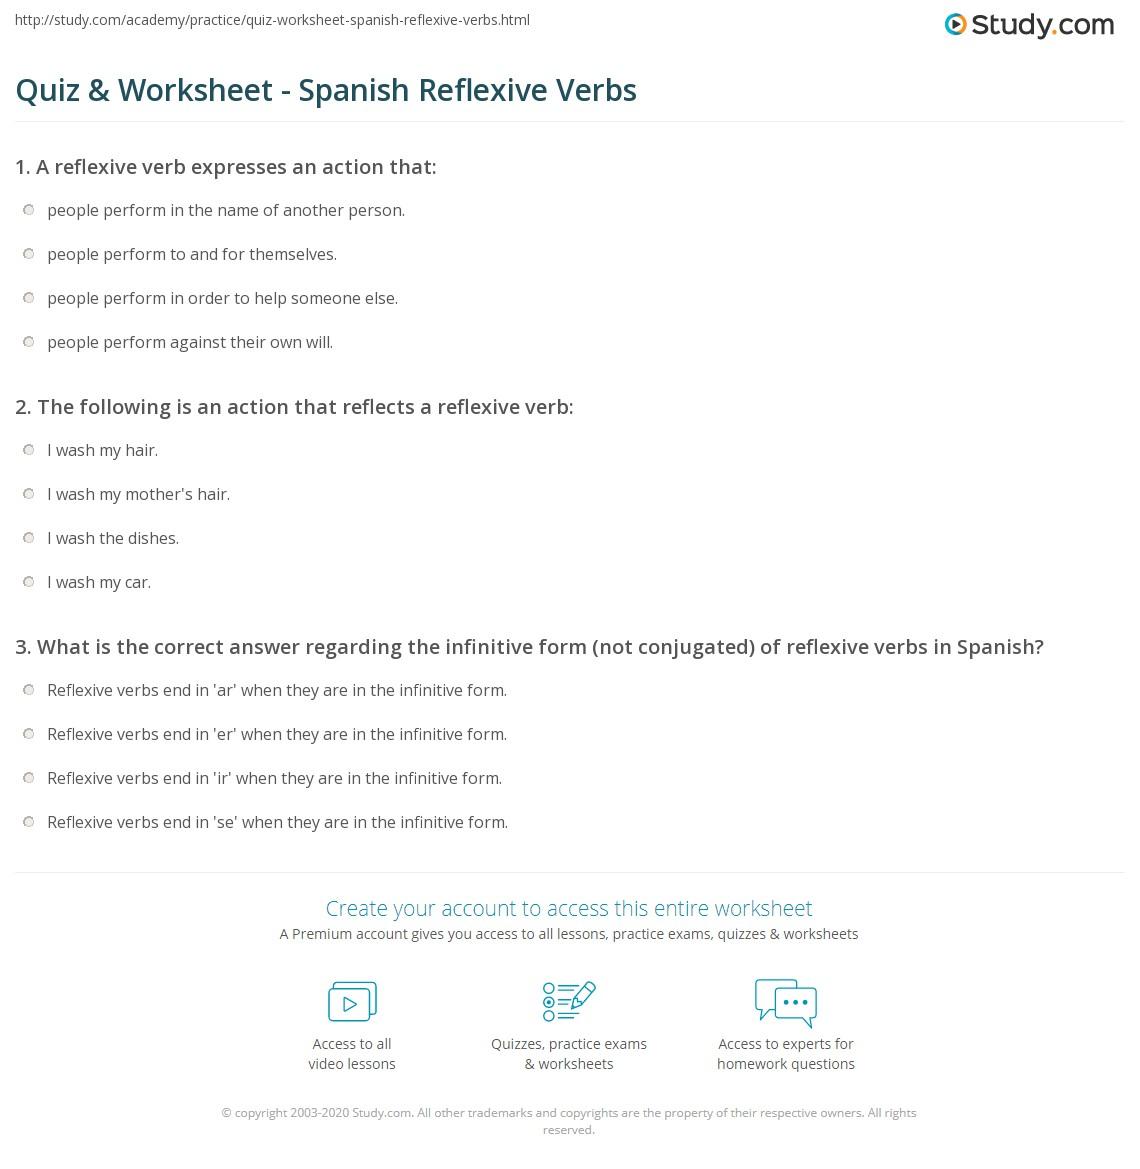 Quiz & Worksheet - Spanish Reflexive Verbs | Study.com